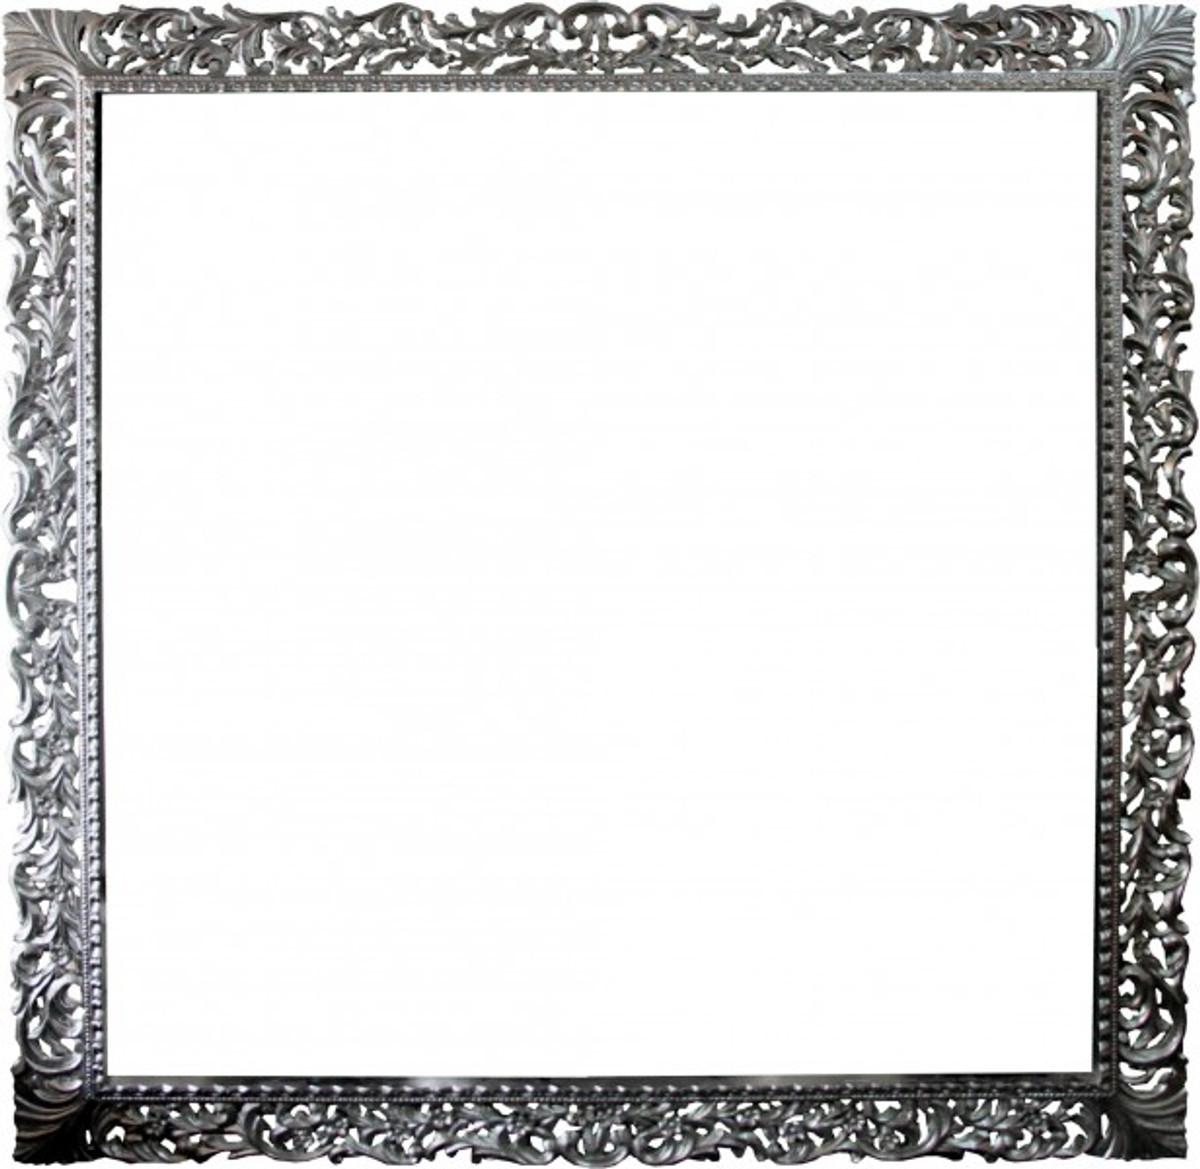 casa padrino baroque wood picture frame 150 x 160 cm silver large television picture frame art nouveau antique style